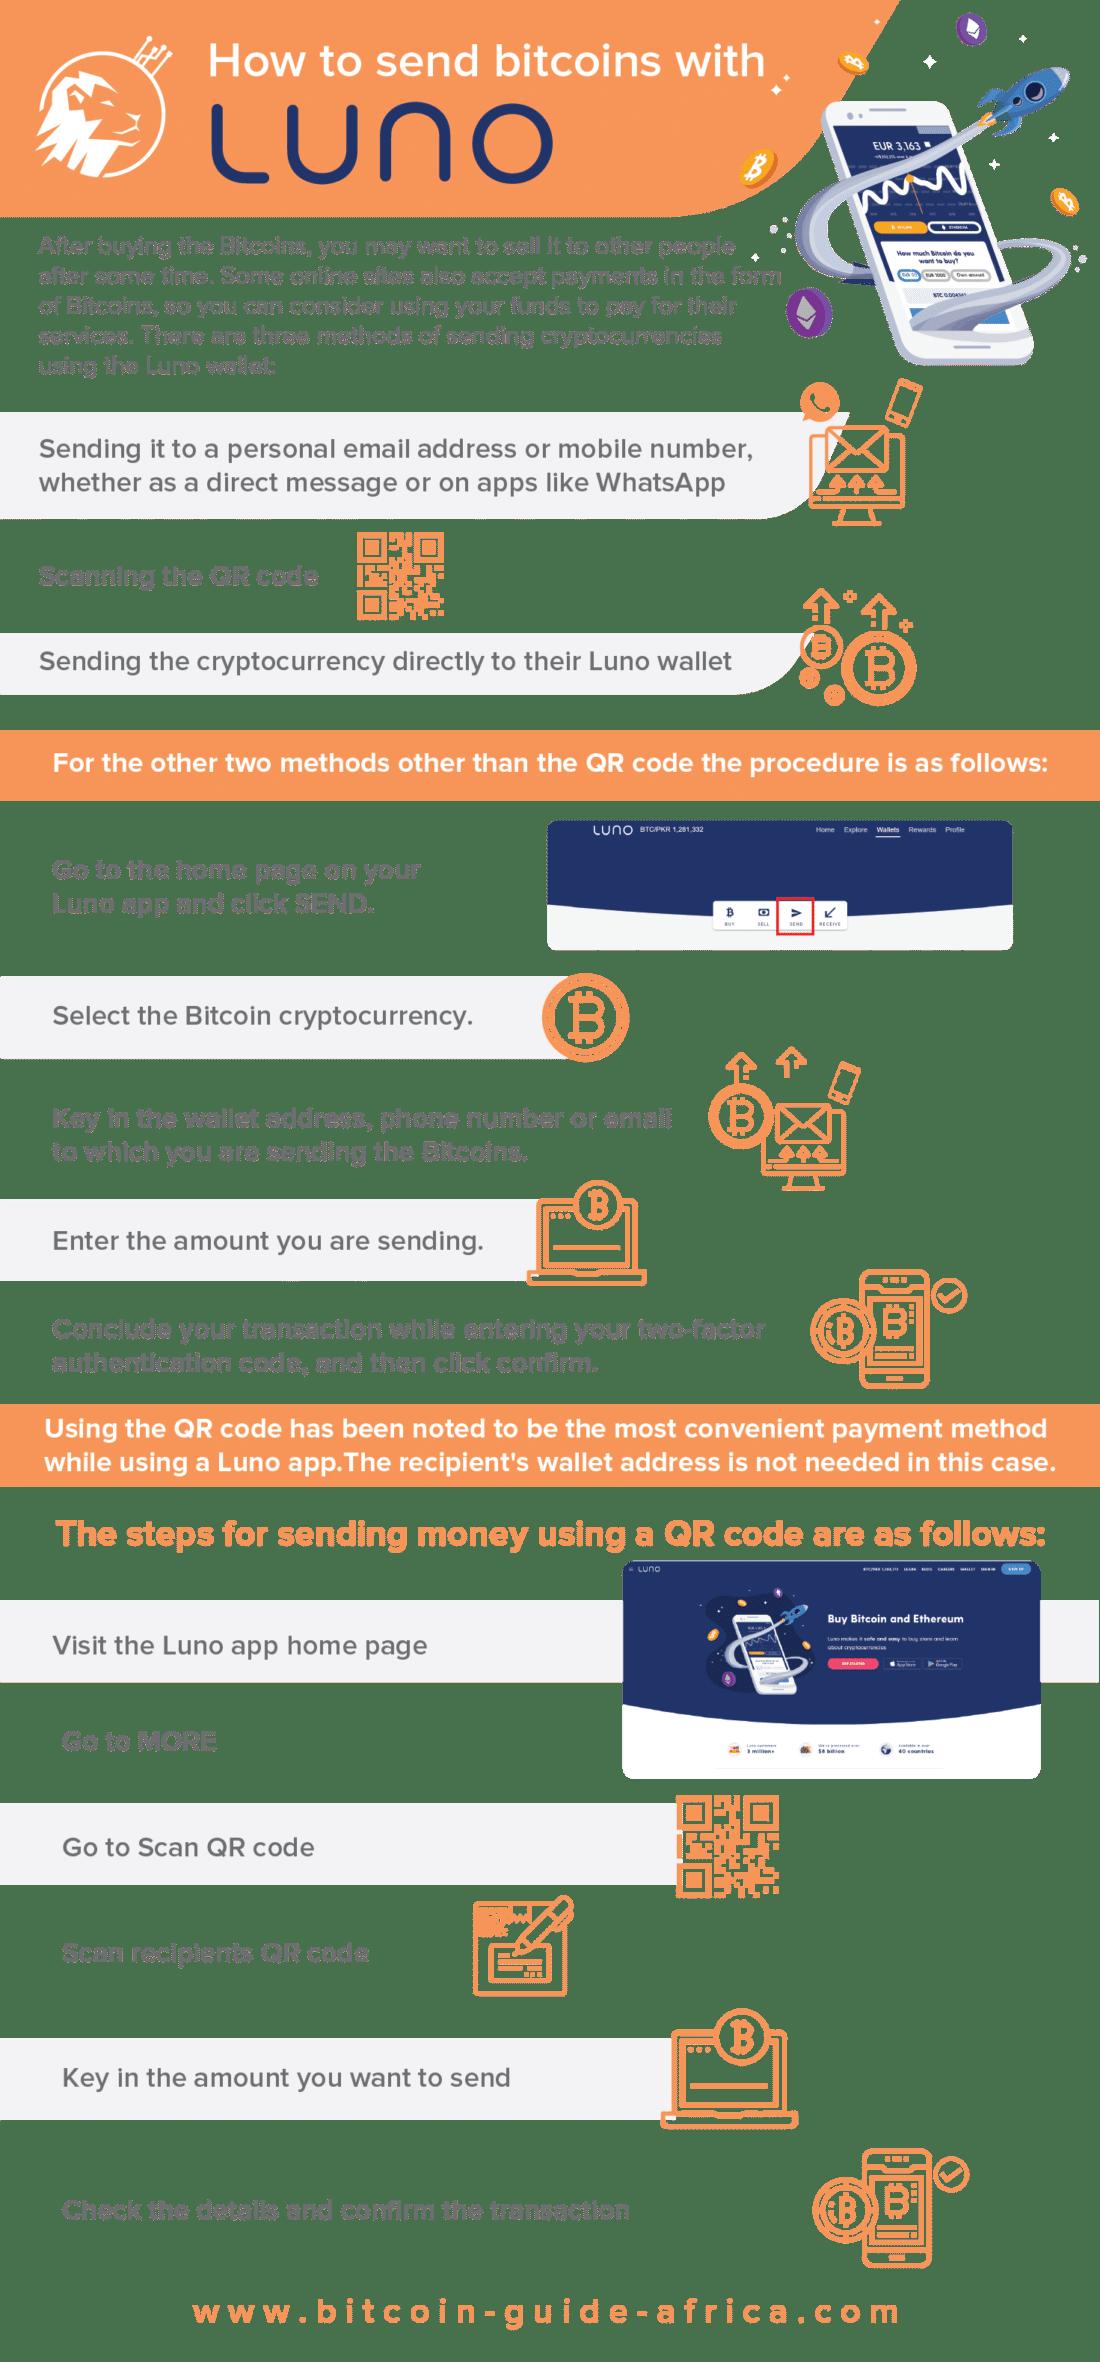 send bitcoins with Luno